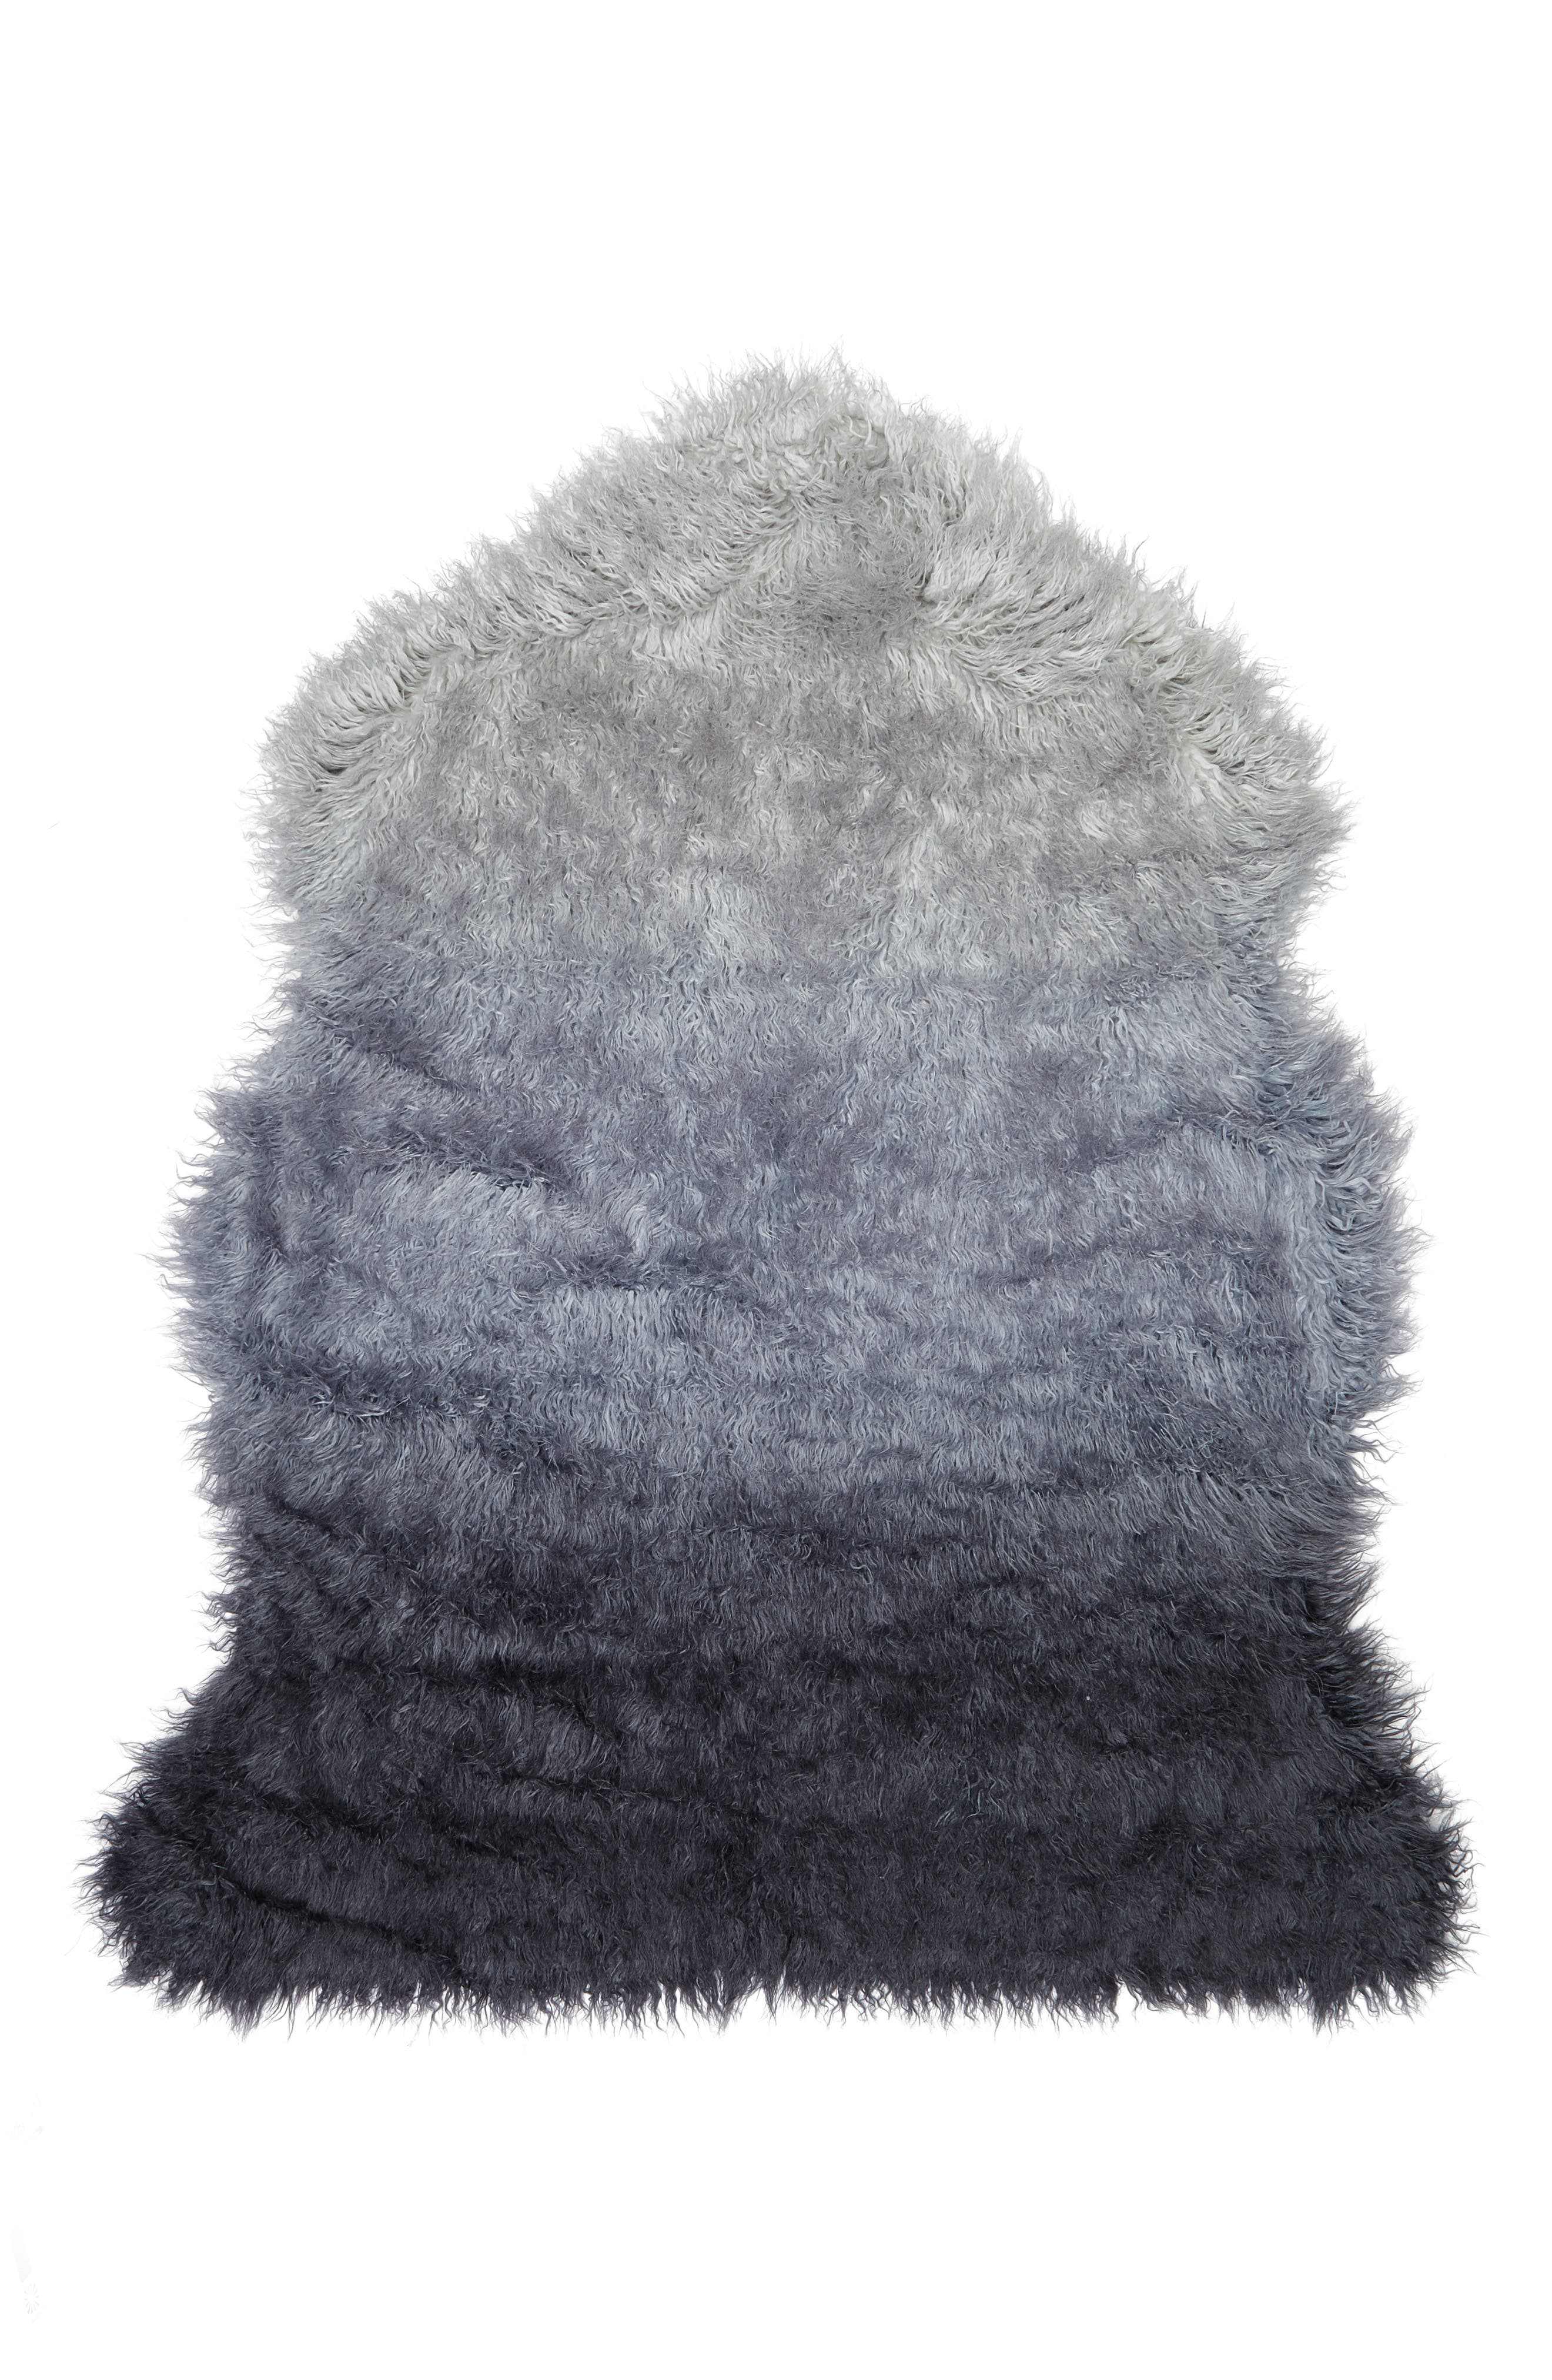 Alternate Image 1 Selected - Nordstrom at Home Ombré Faux Fur Rug